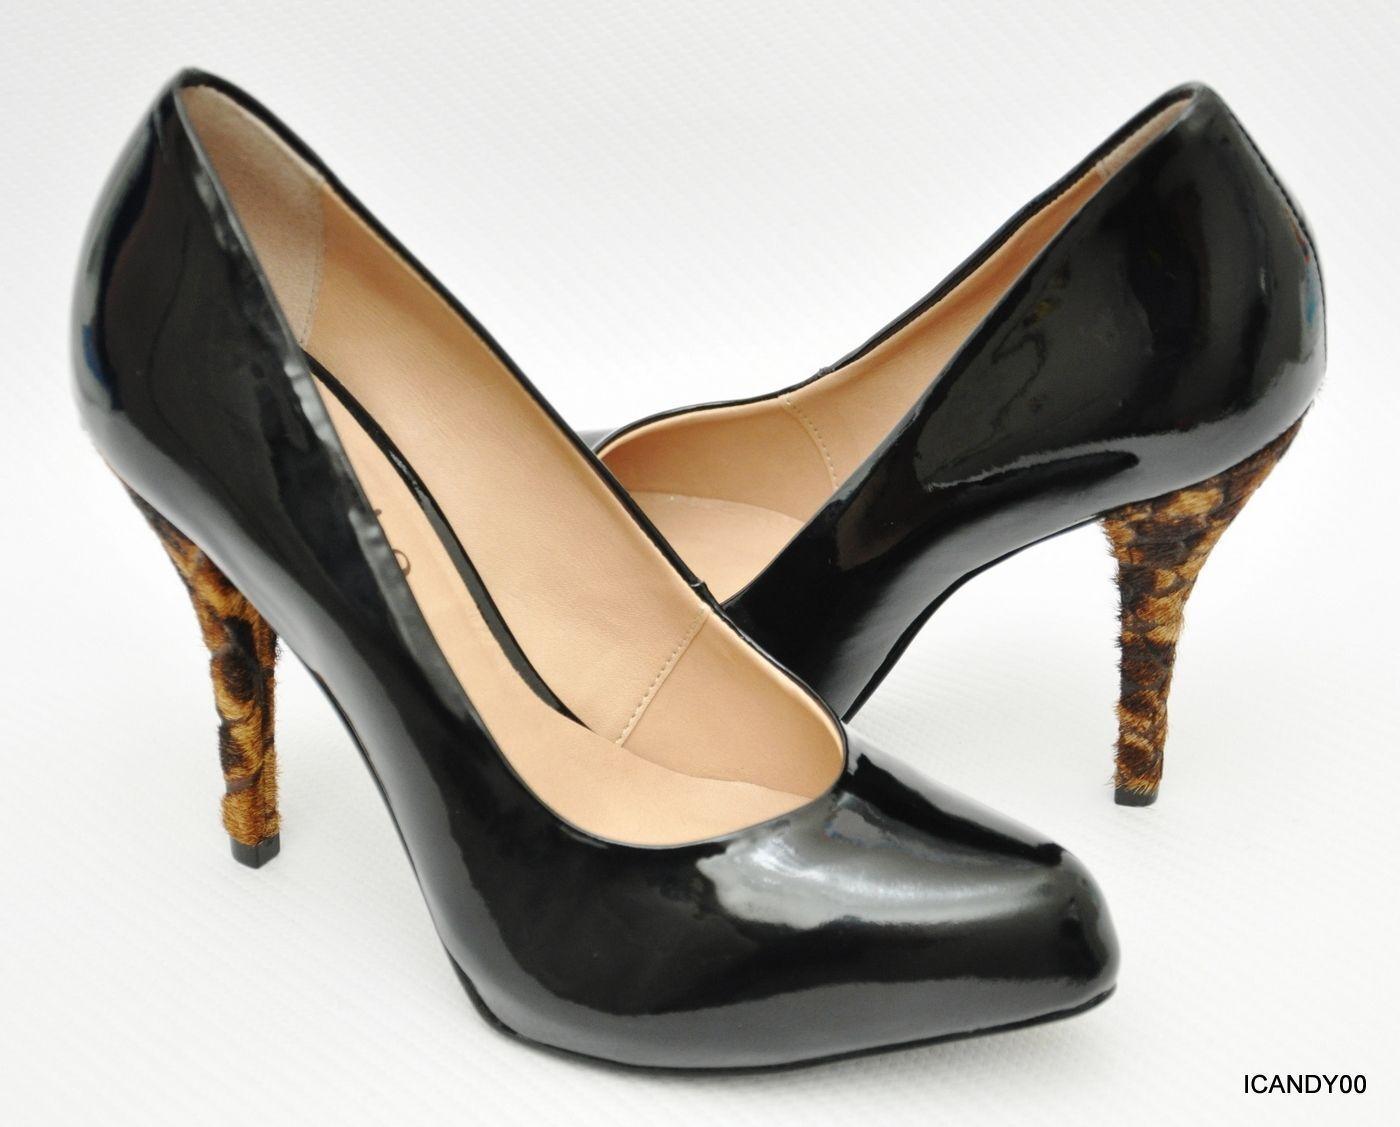 New Miucha Brazil Patent Leather Platform Pump Calf Hair Heel Black 6 37